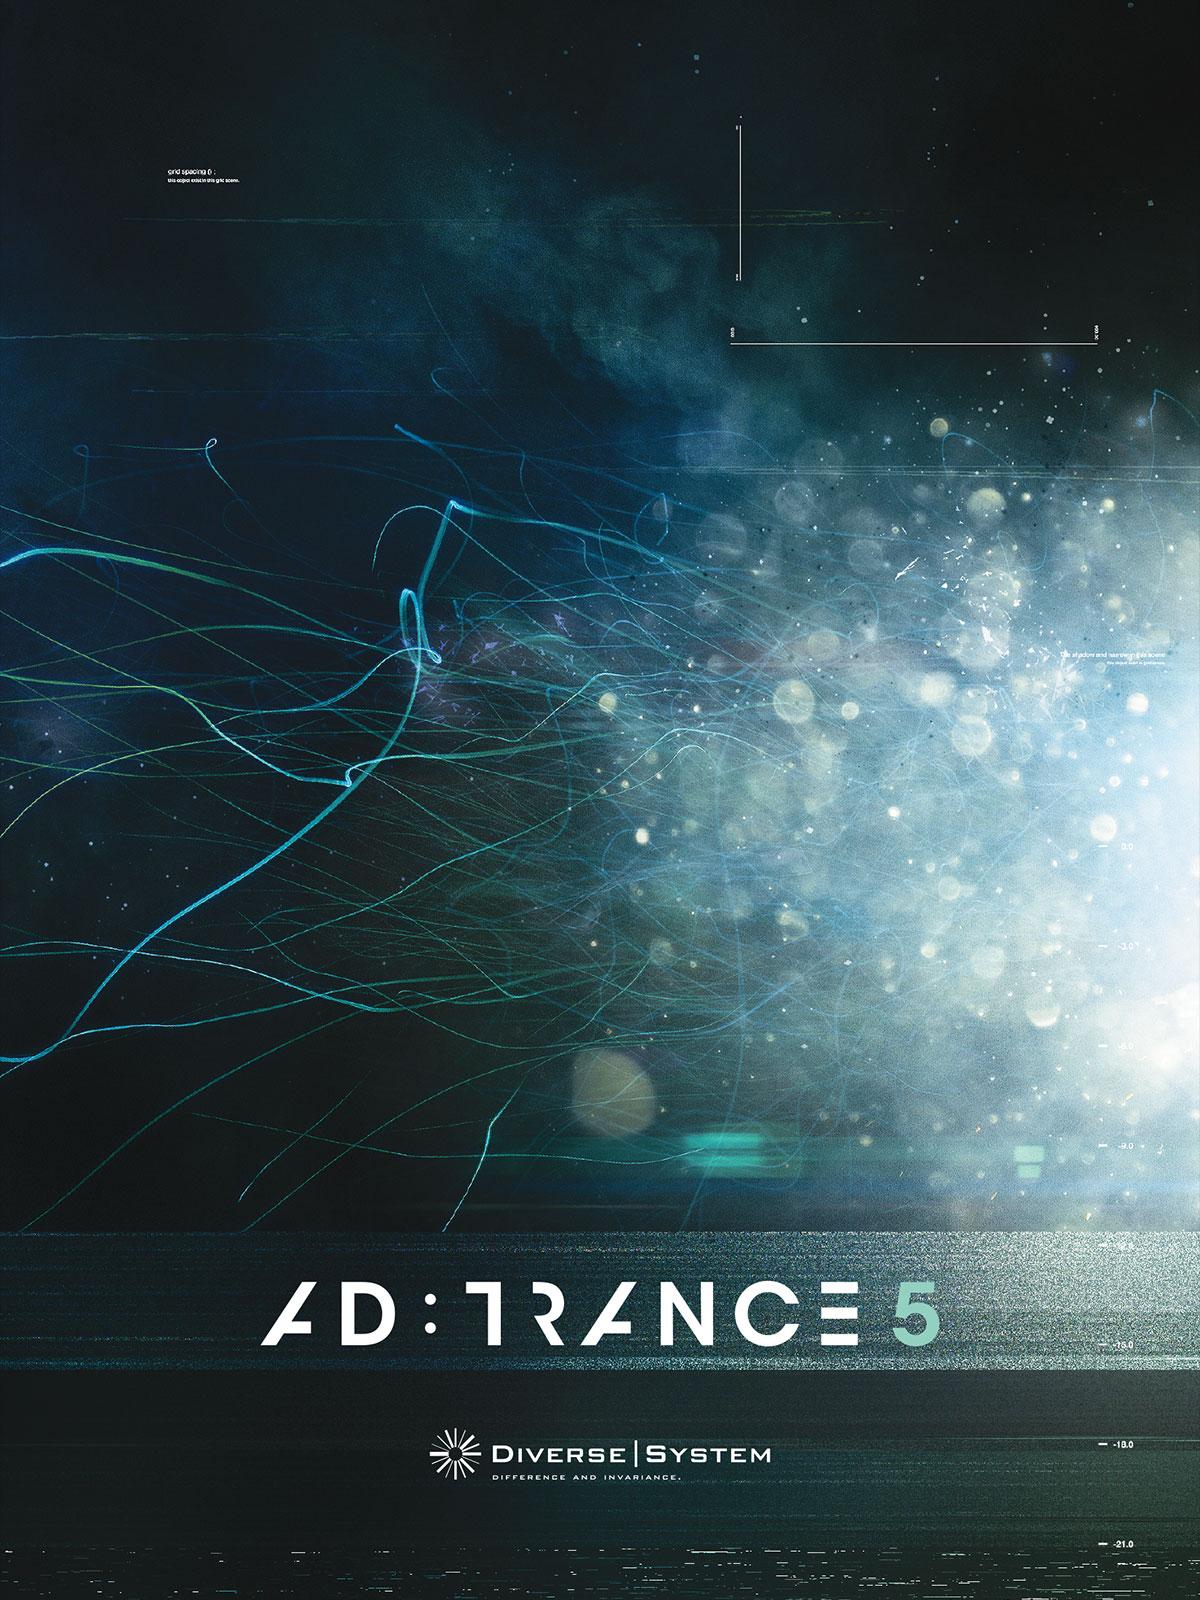 trans-5